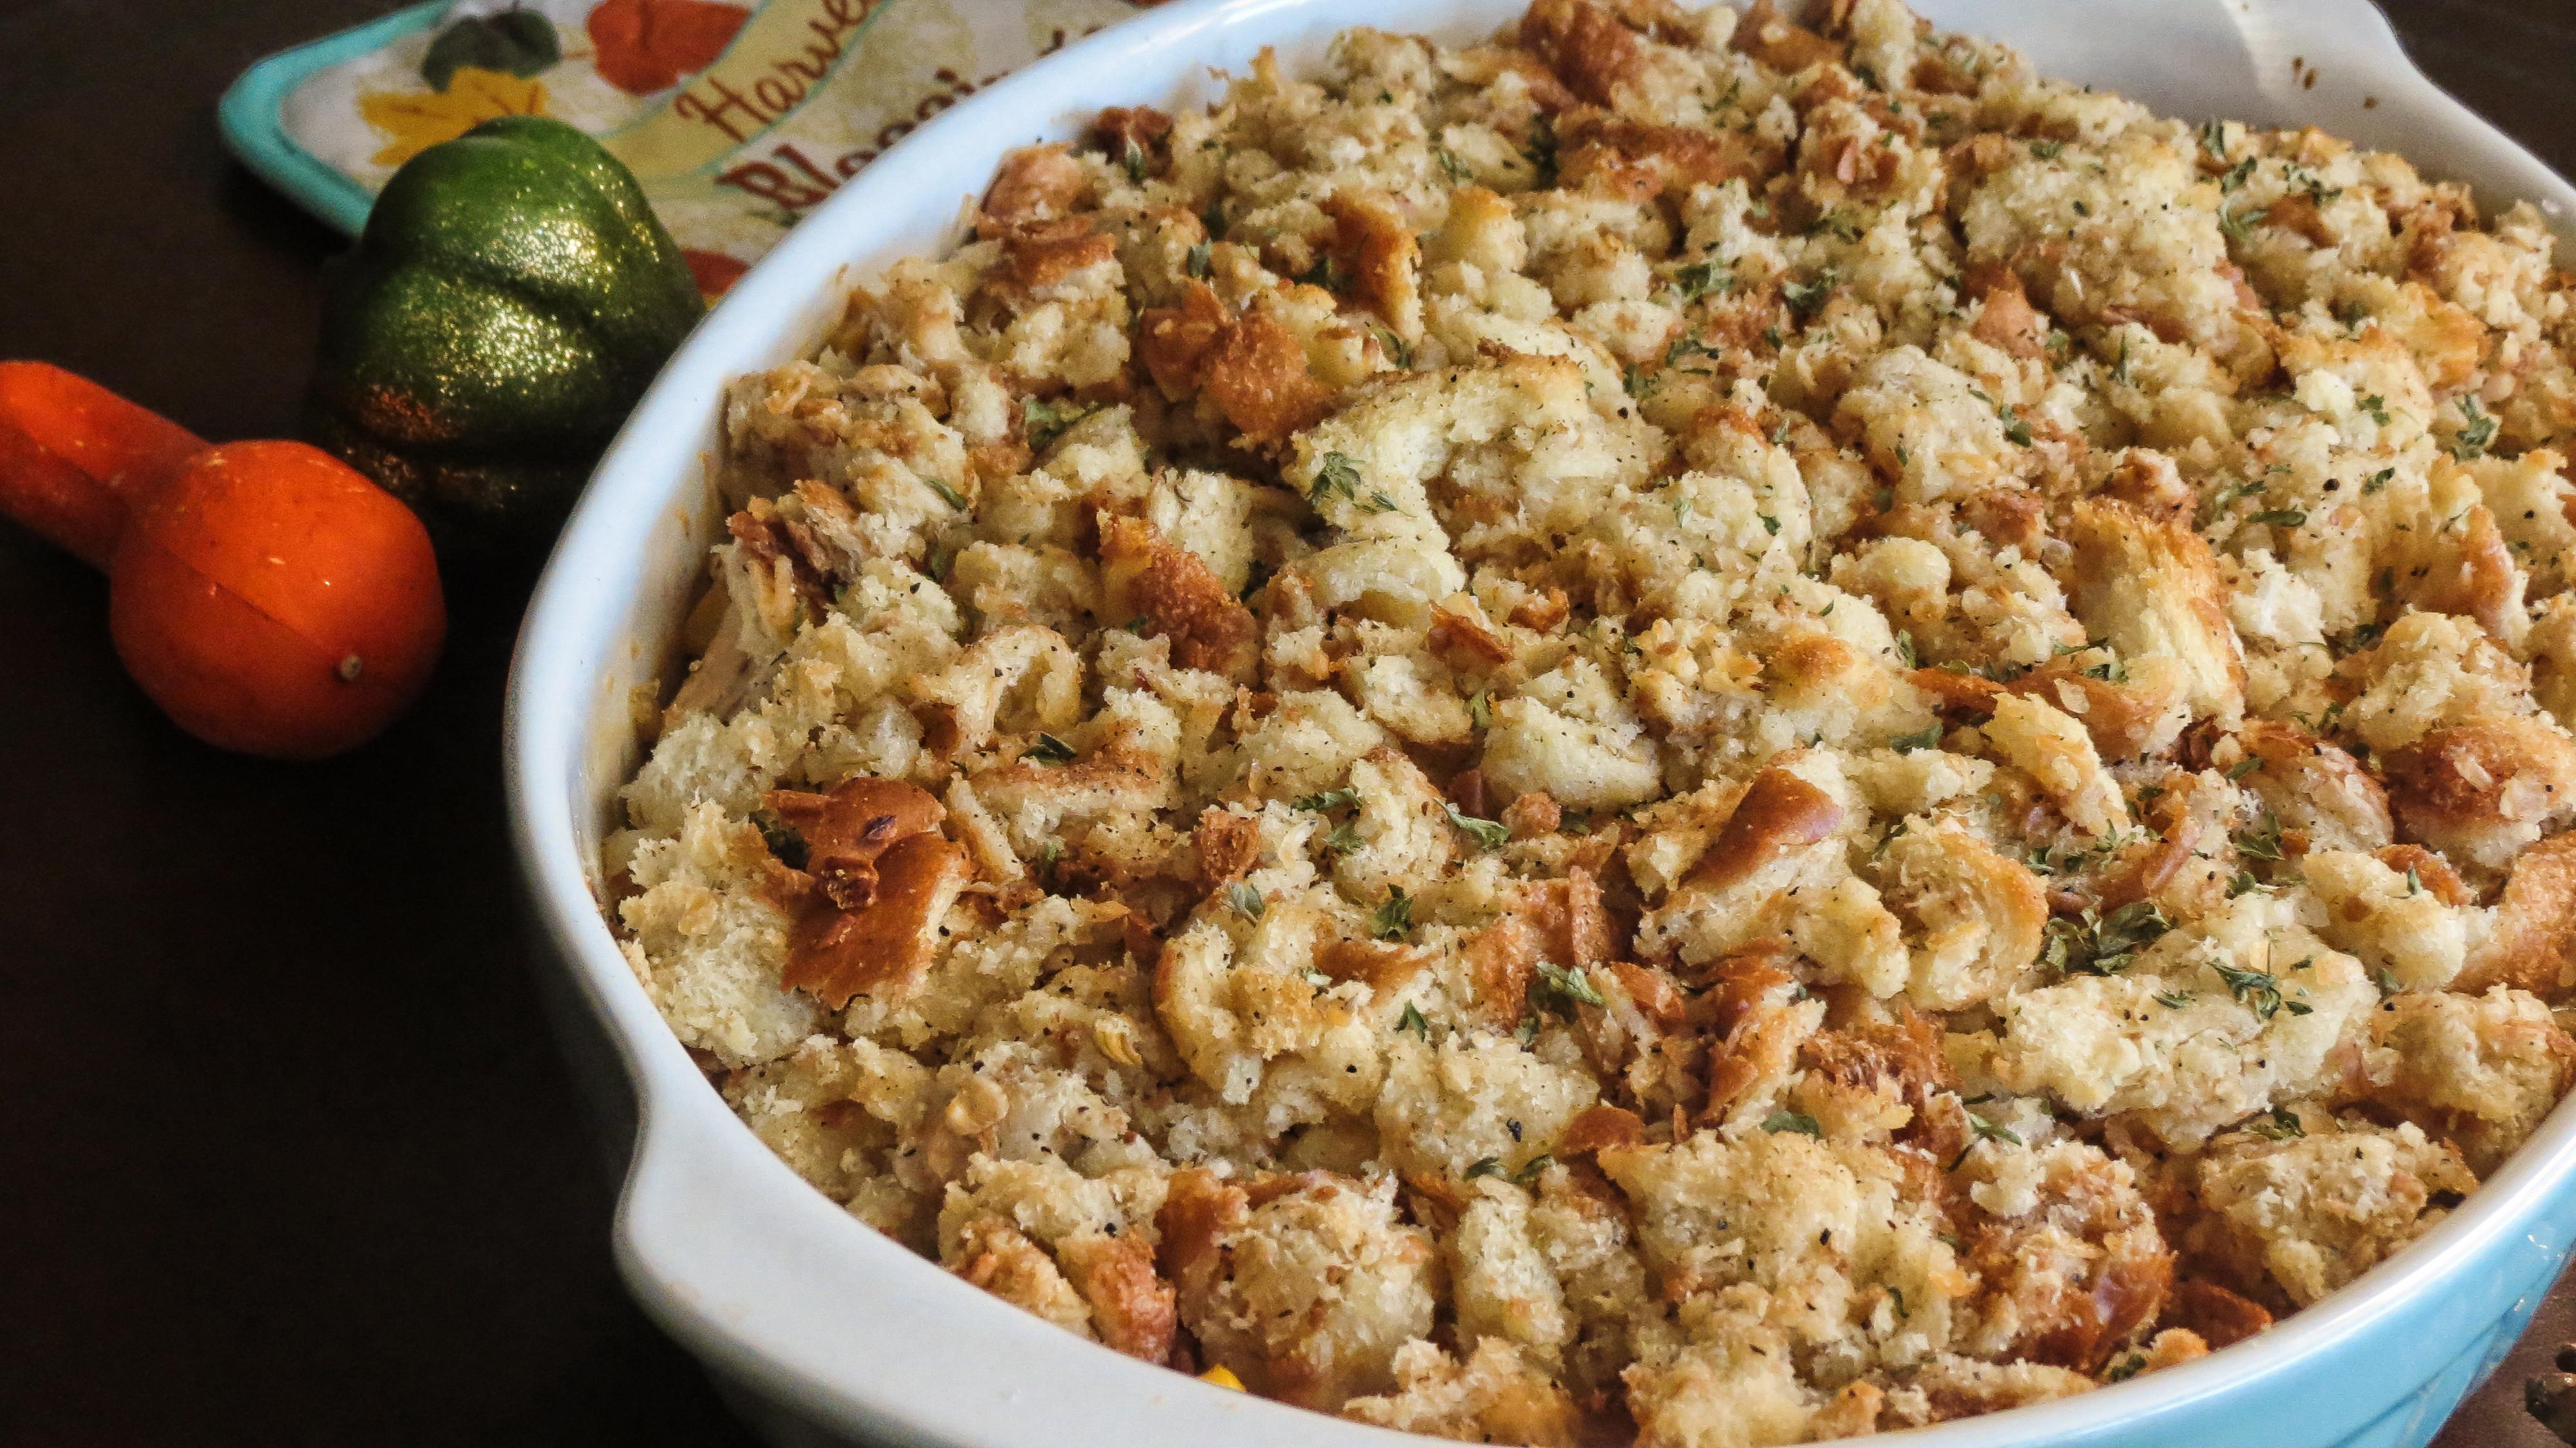 Thanksgiving Leftovers Casserole  Thanksgiving Leftovers Casserole I m Luving This Life